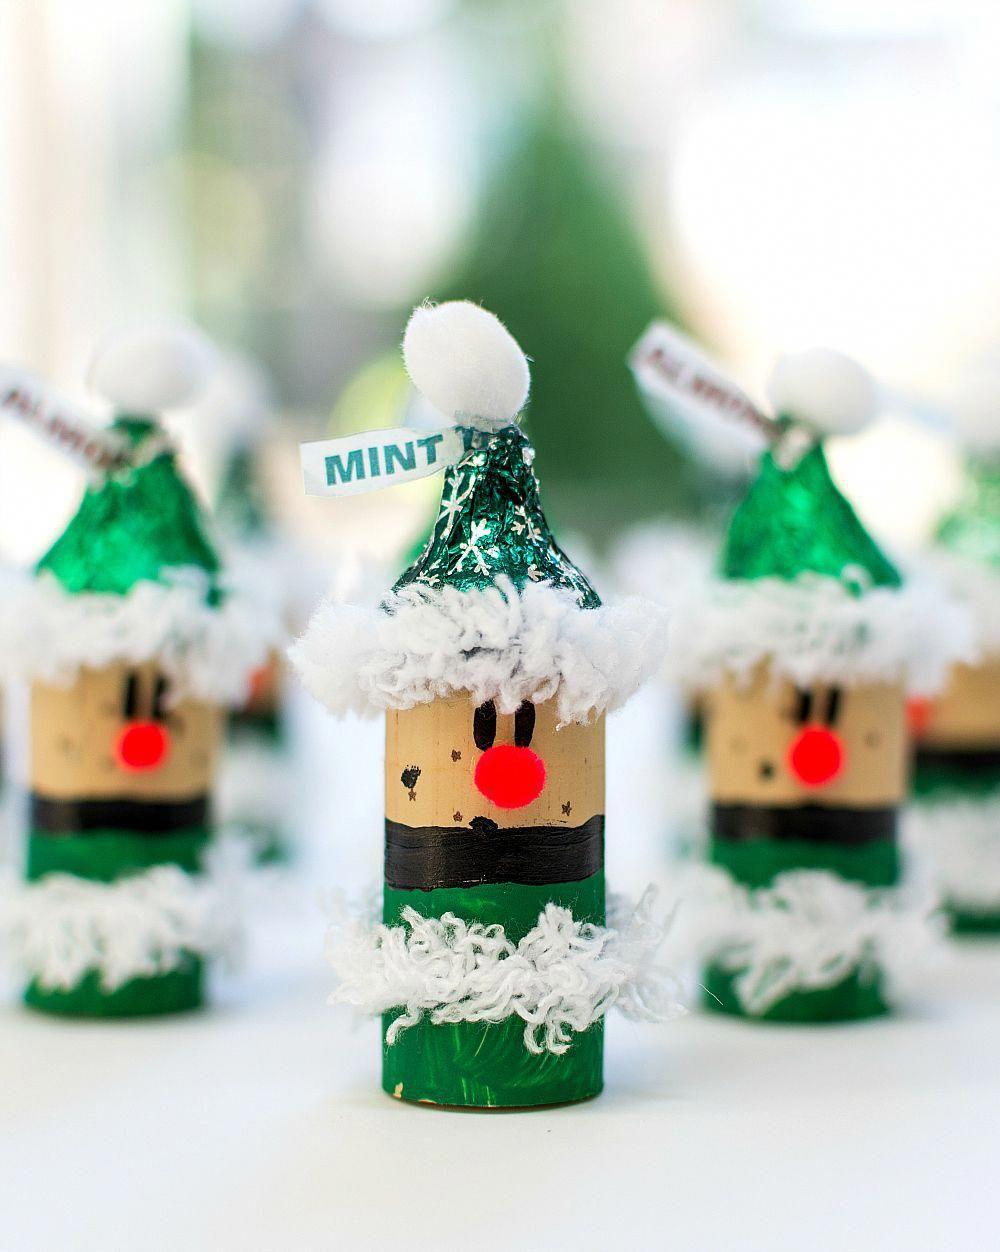 Christmas Craft Ideas for Kids Wine Cork Elves with @hersheyskisses ...